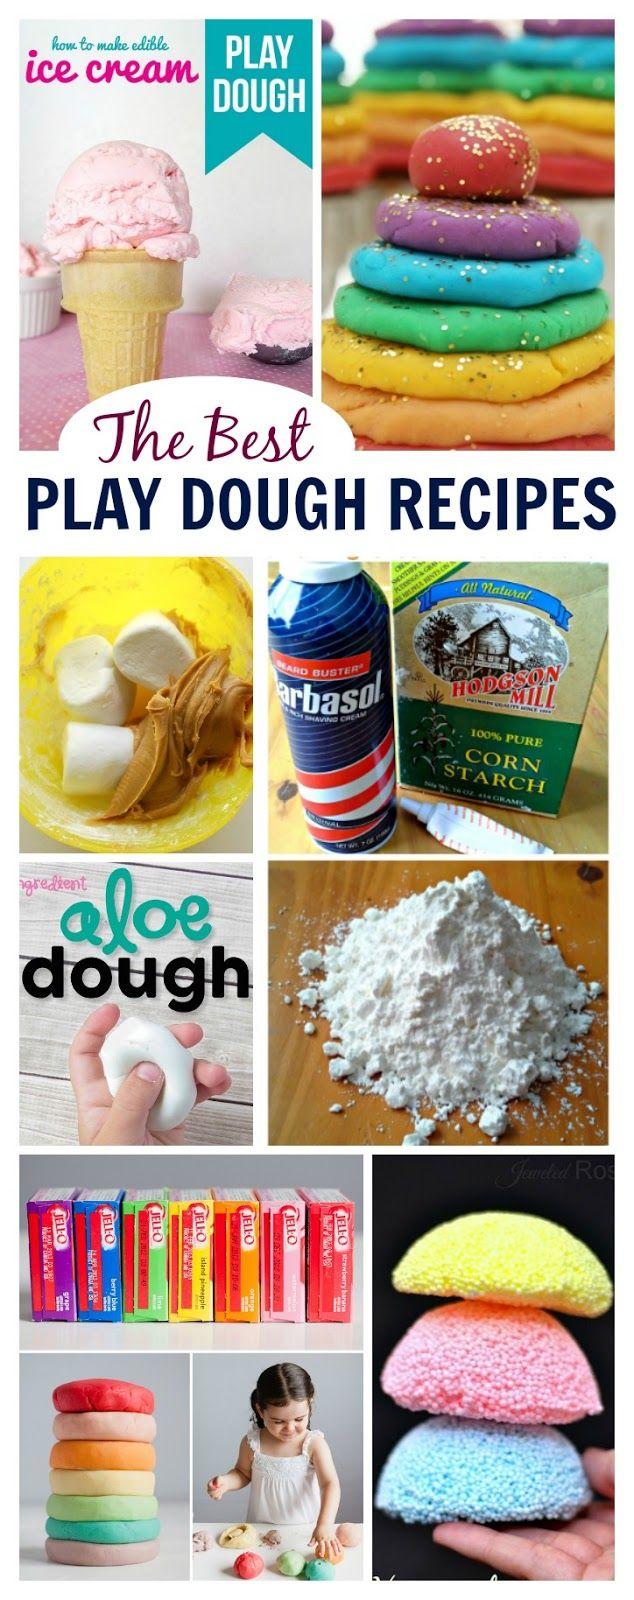 The very best play dough recipes for kids- FLOAM, foam dough, ice cream dough, galaxy dough, & more!  Some I've never seen before!